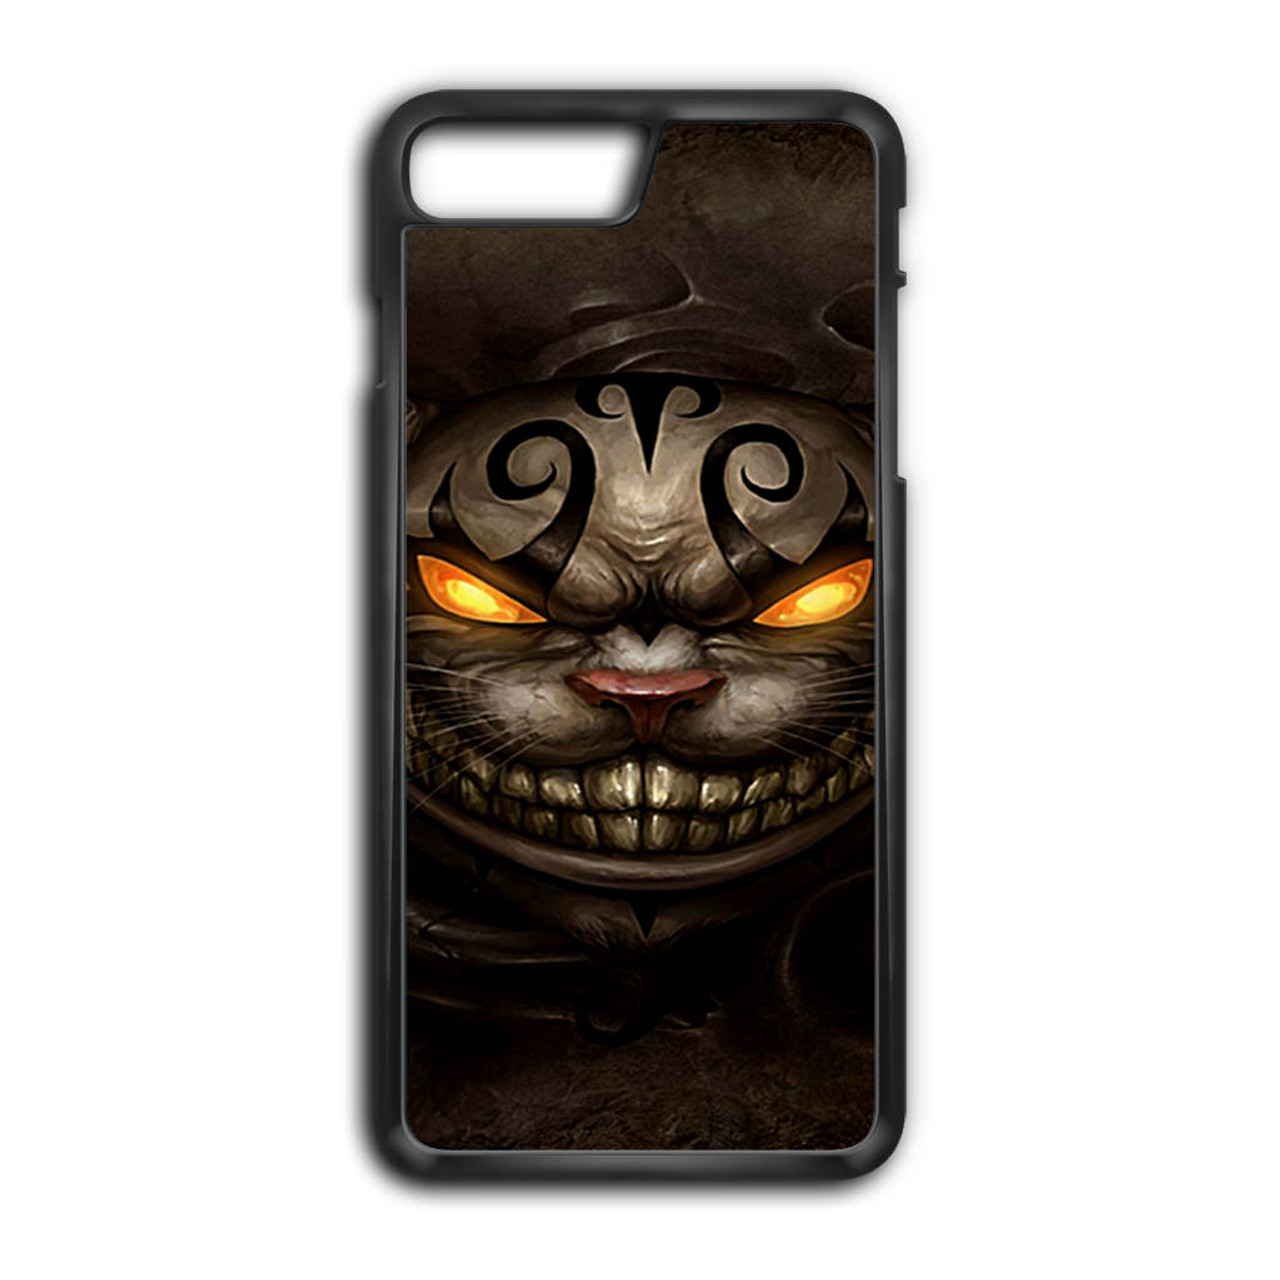 sale retailer 78ef4 81d2e Cat Cheshire Disney iPhone 8 Plus Case